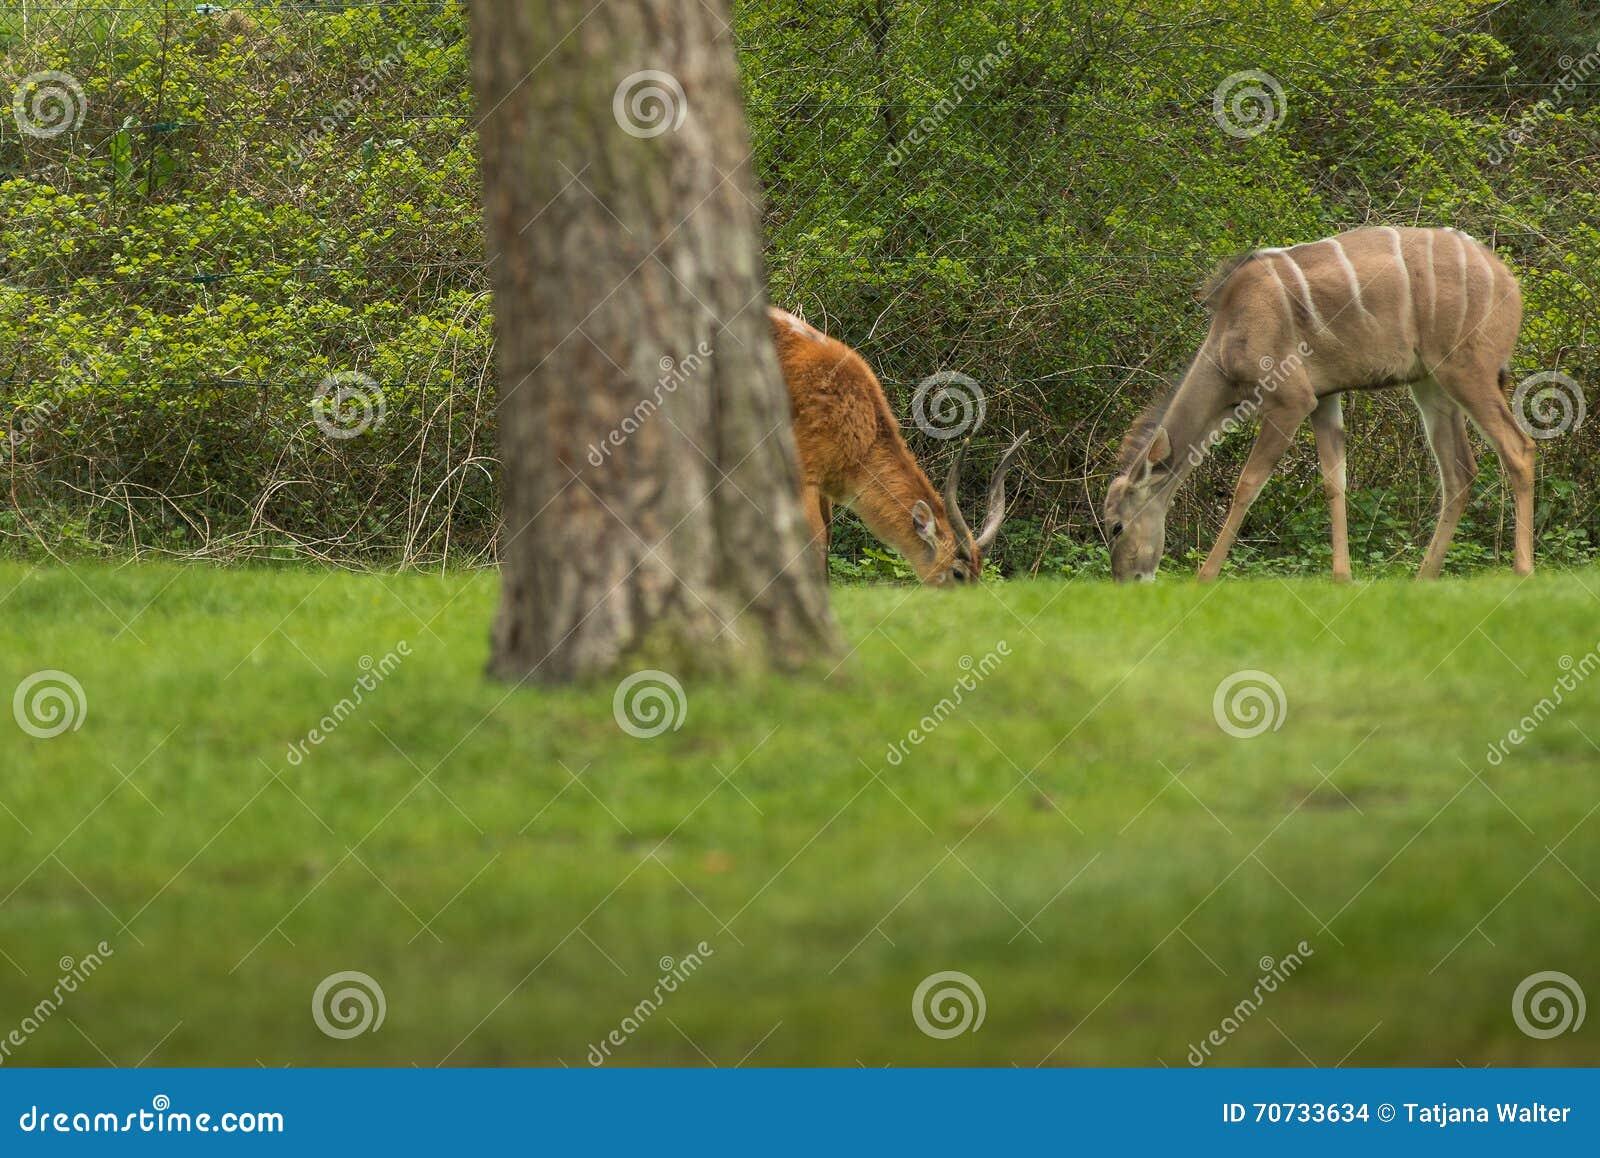 Lechwe (水羚属leche)是类waterbuck的羚羊